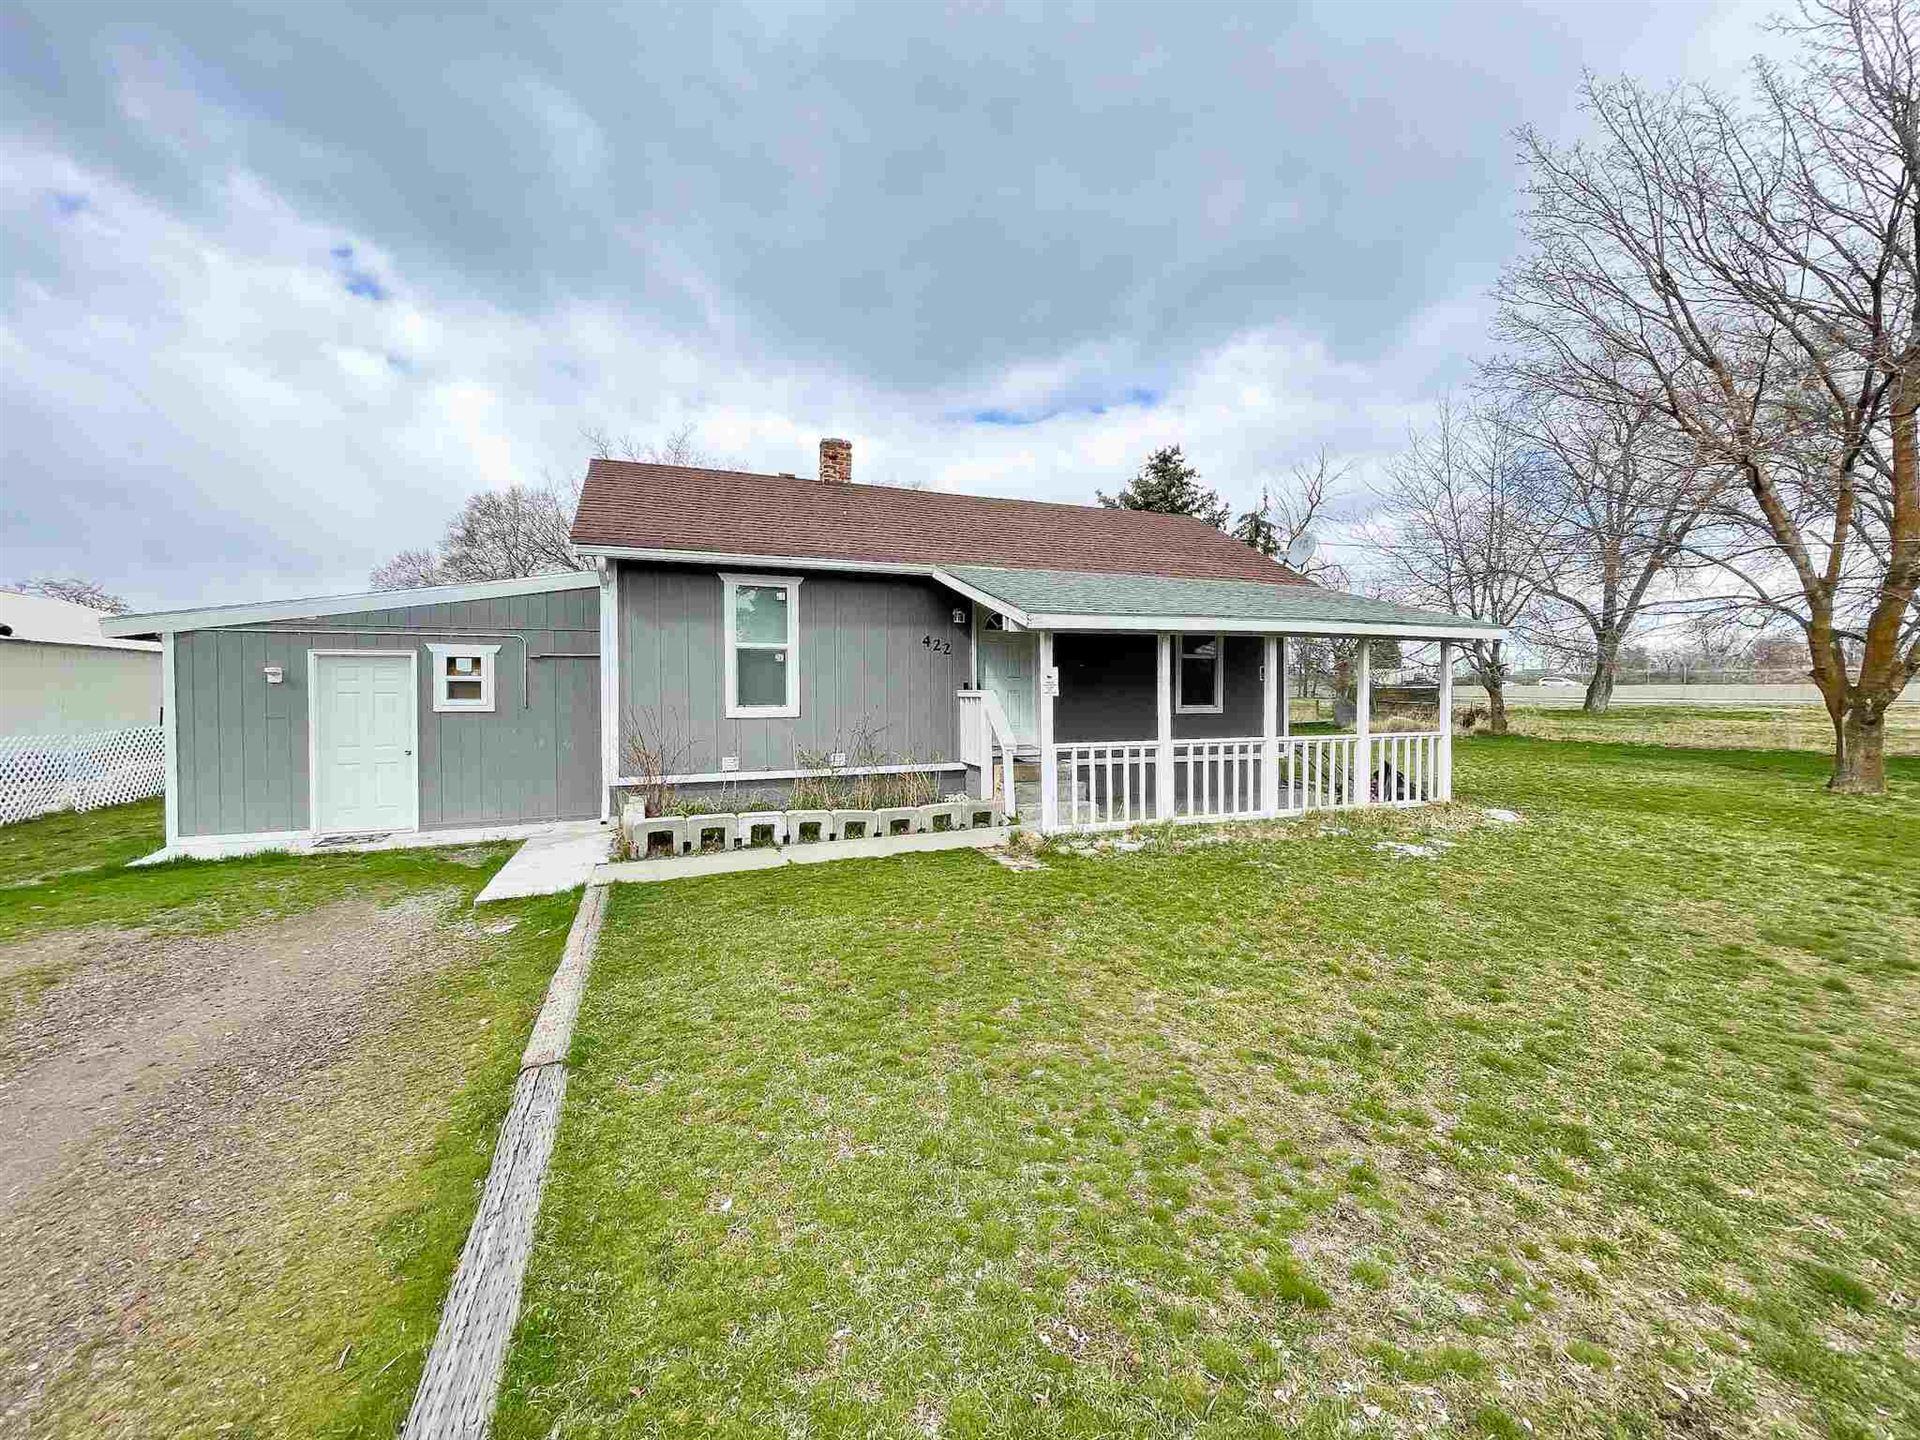 422 S CHRONICLE Rd, Spokane Valley, WA 99212 - #: 202113241